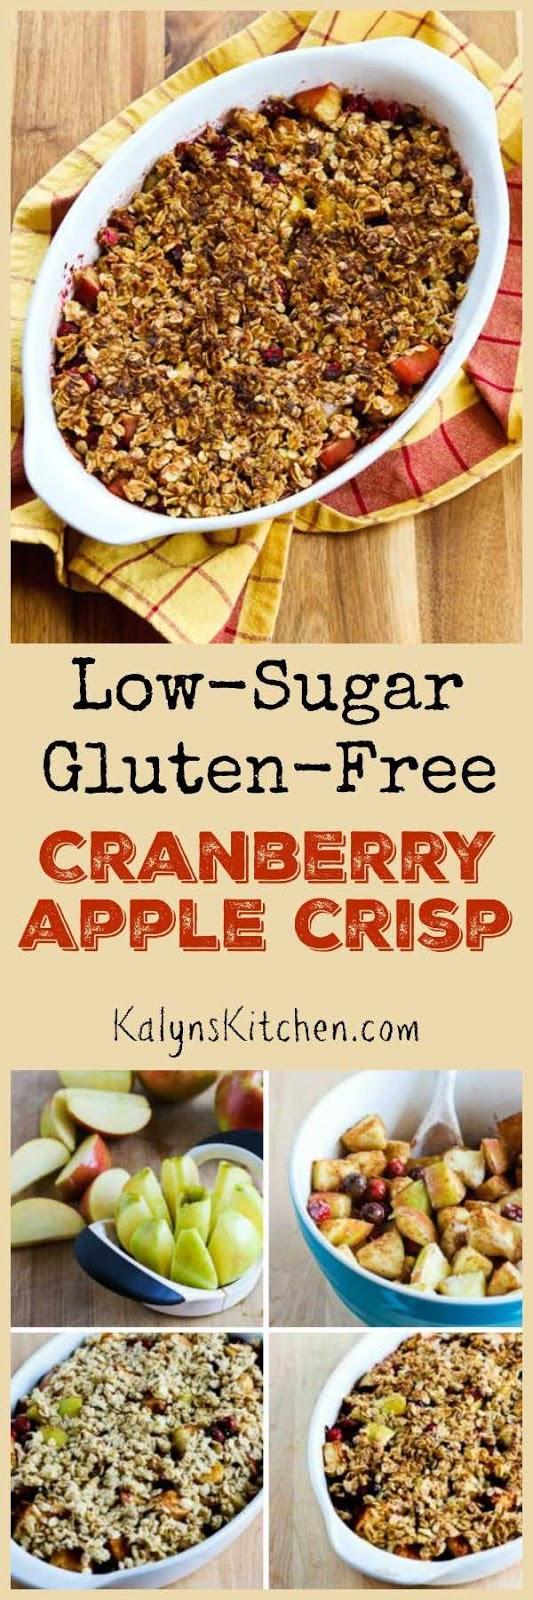 Low-Sugar and Gluten-Free Cranberry Apple Crisp - Kalyn's ...